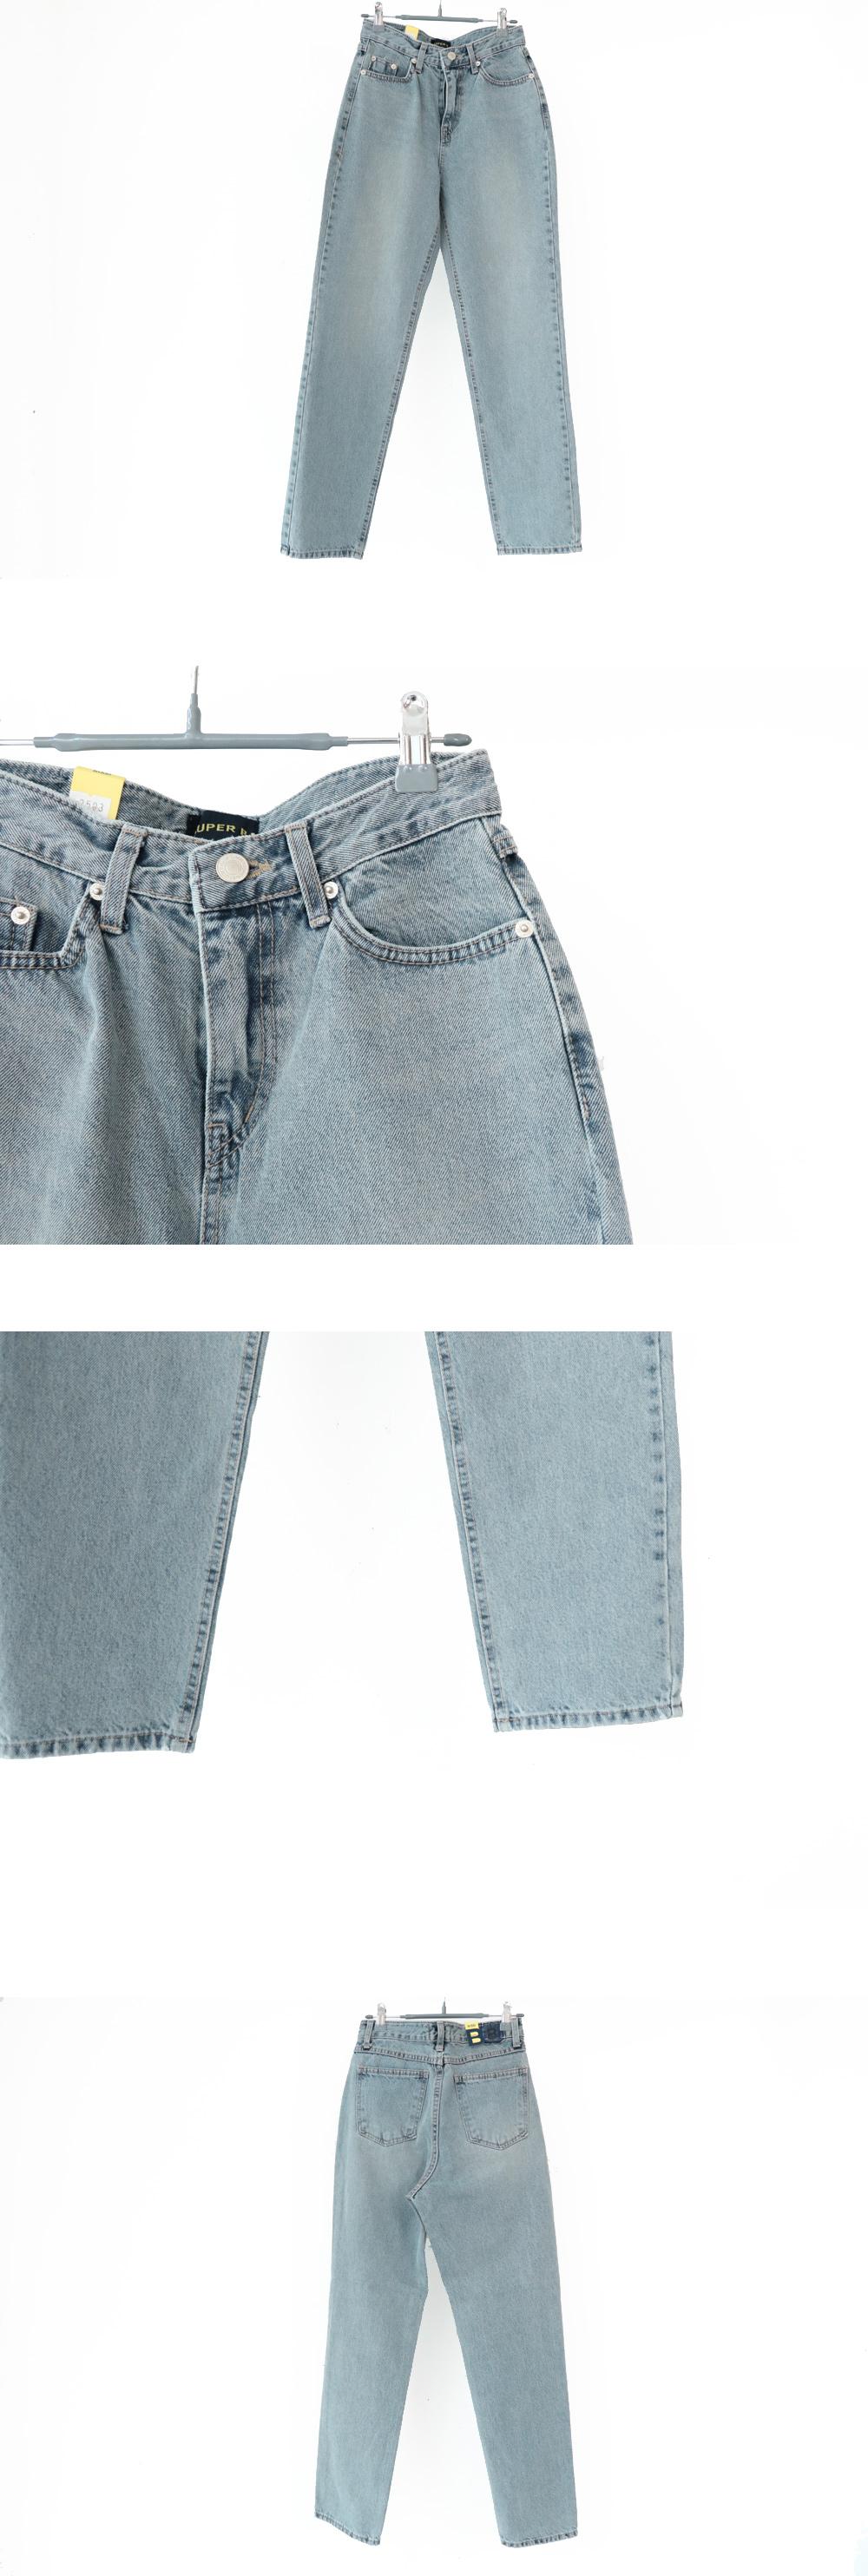 2503 light blue baggy denim pants